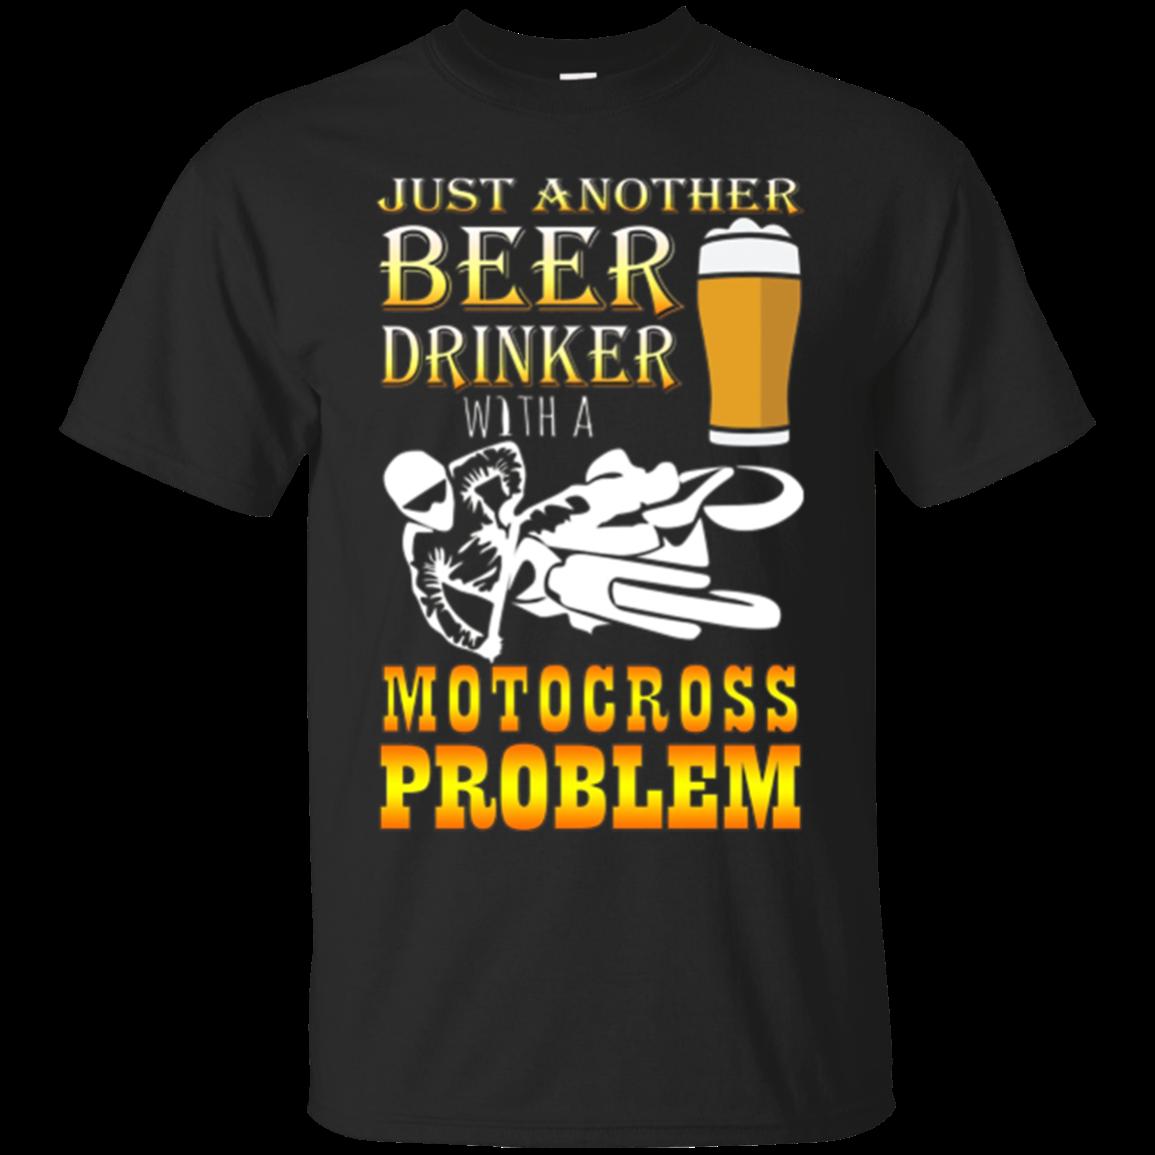 Motocross Problem T Shirt